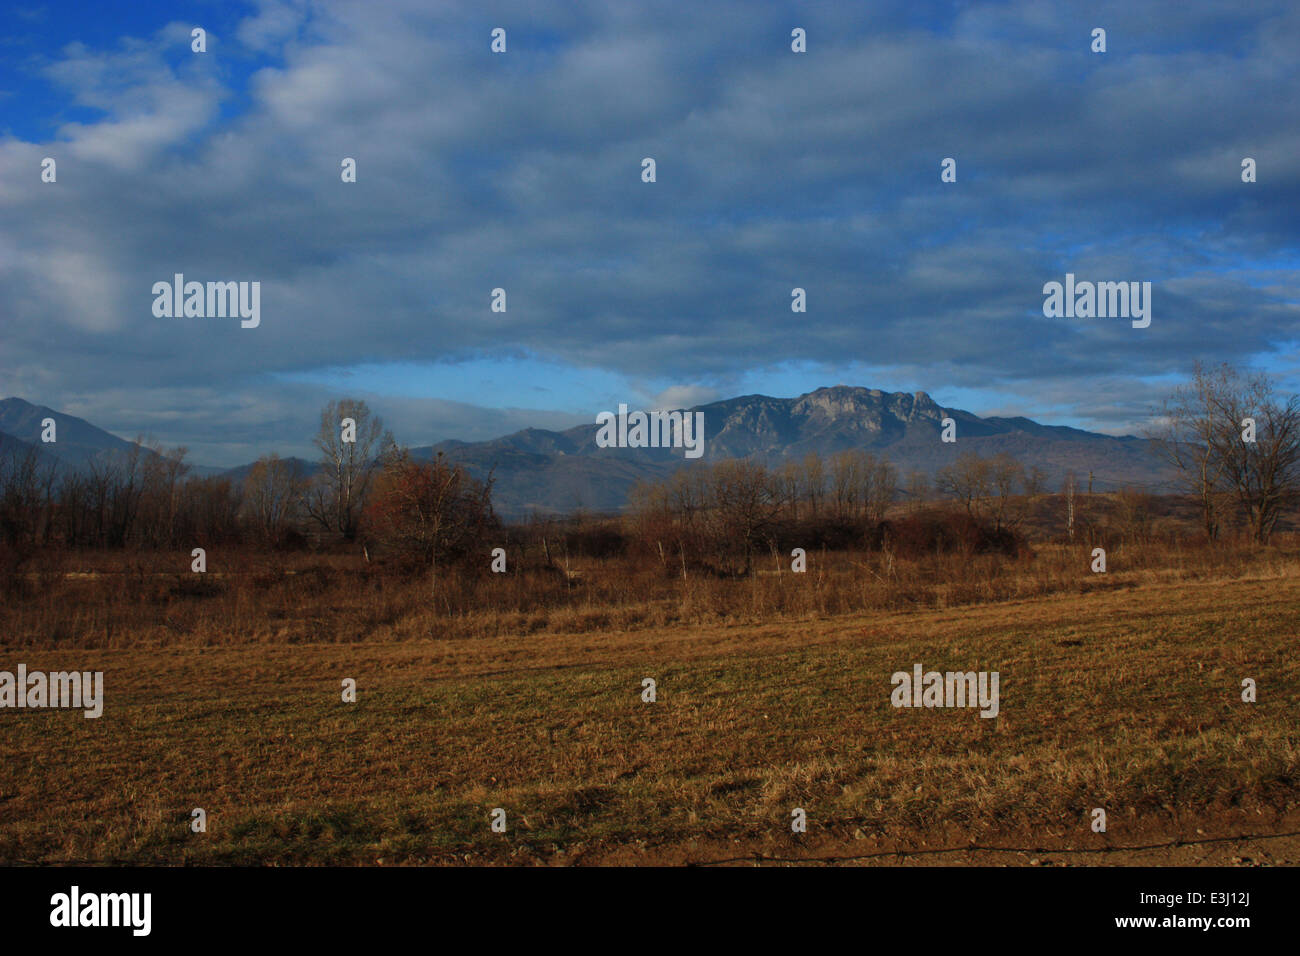 Cozia peak, Carpathian mountain, unspoiled place in Romania. Stock Photo